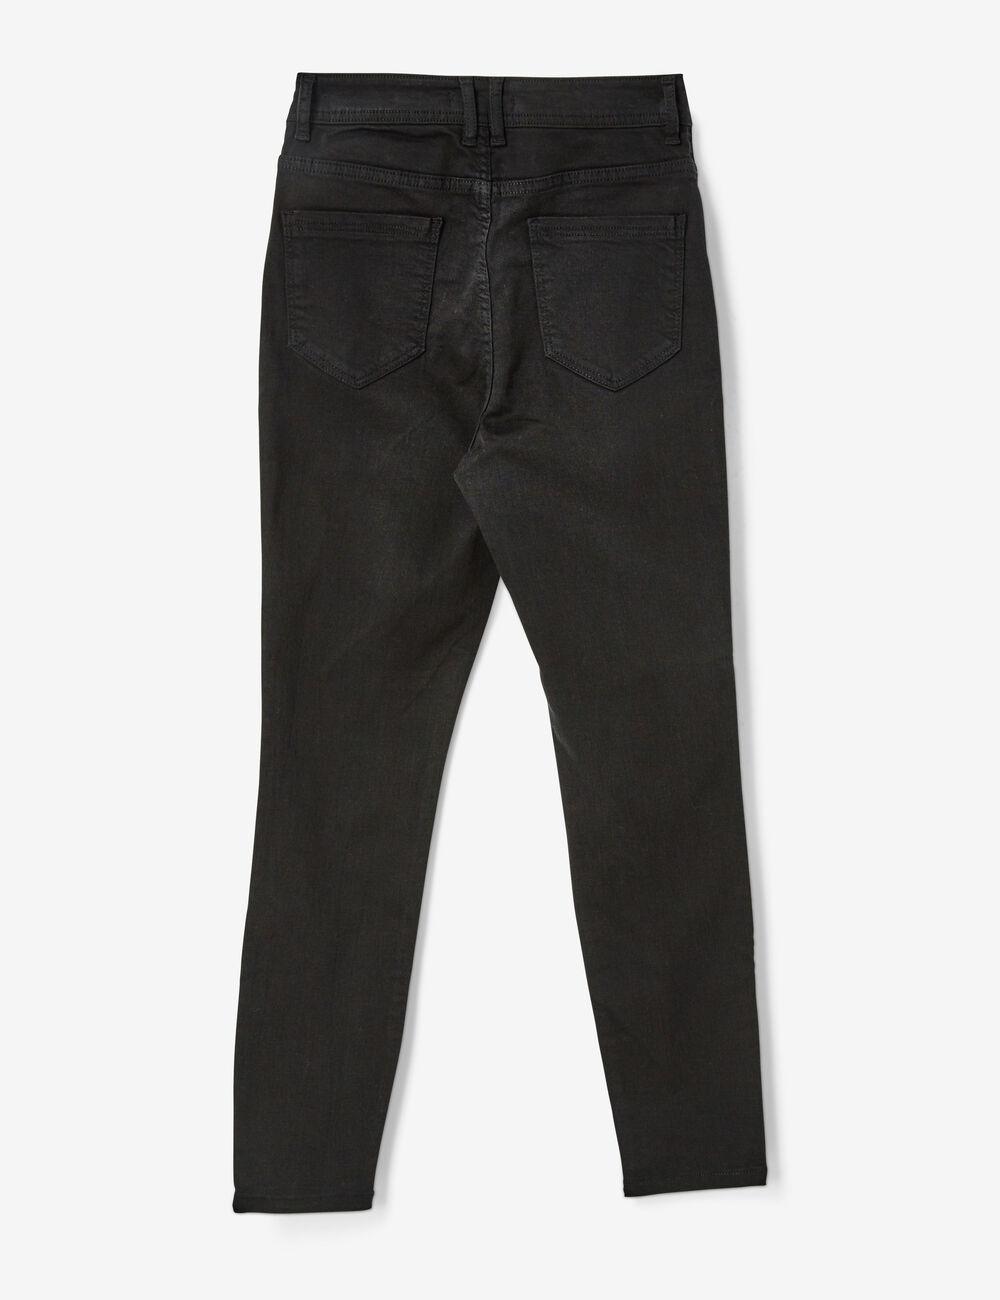 pantalon taille haute gris anthracite femme jennyfer. Black Bedroom Furniture Sets. Home Design Ideas